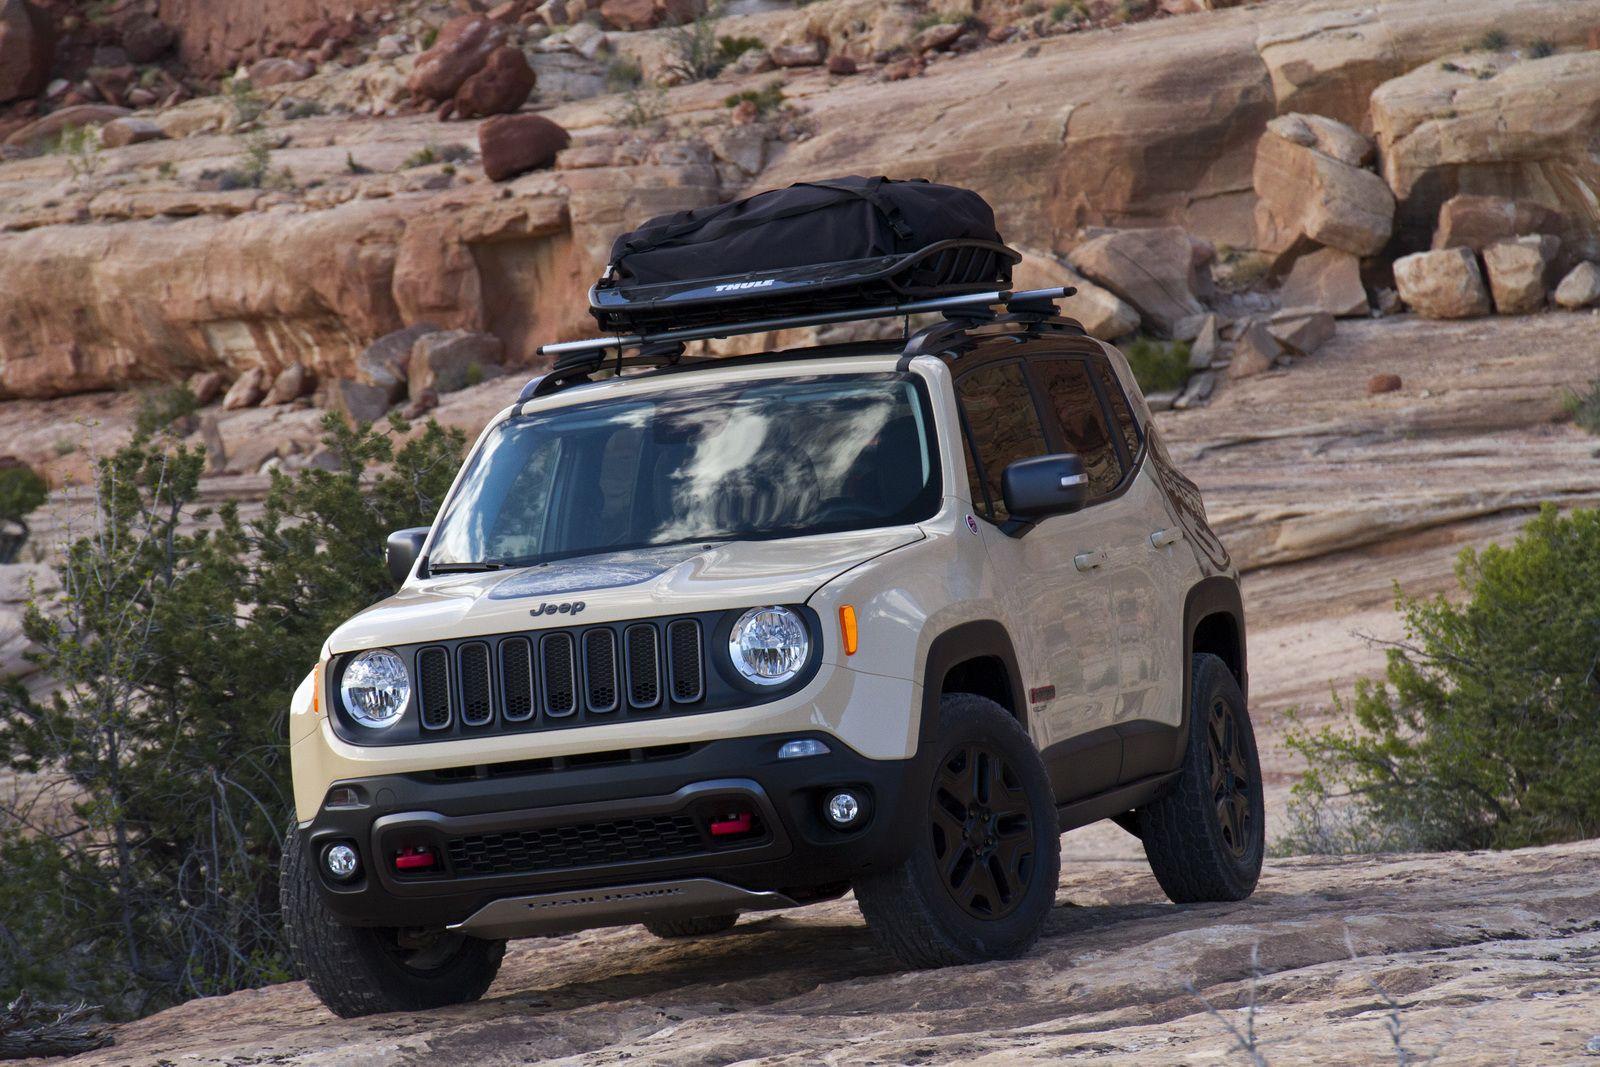 3bce67dcbbecdec77c7e9676706a5ae0 jeep renegade desert hawk 1 jk forum jeep renegade (bu Yellow Jeep Renegade Accessories at honlapkeszites.co